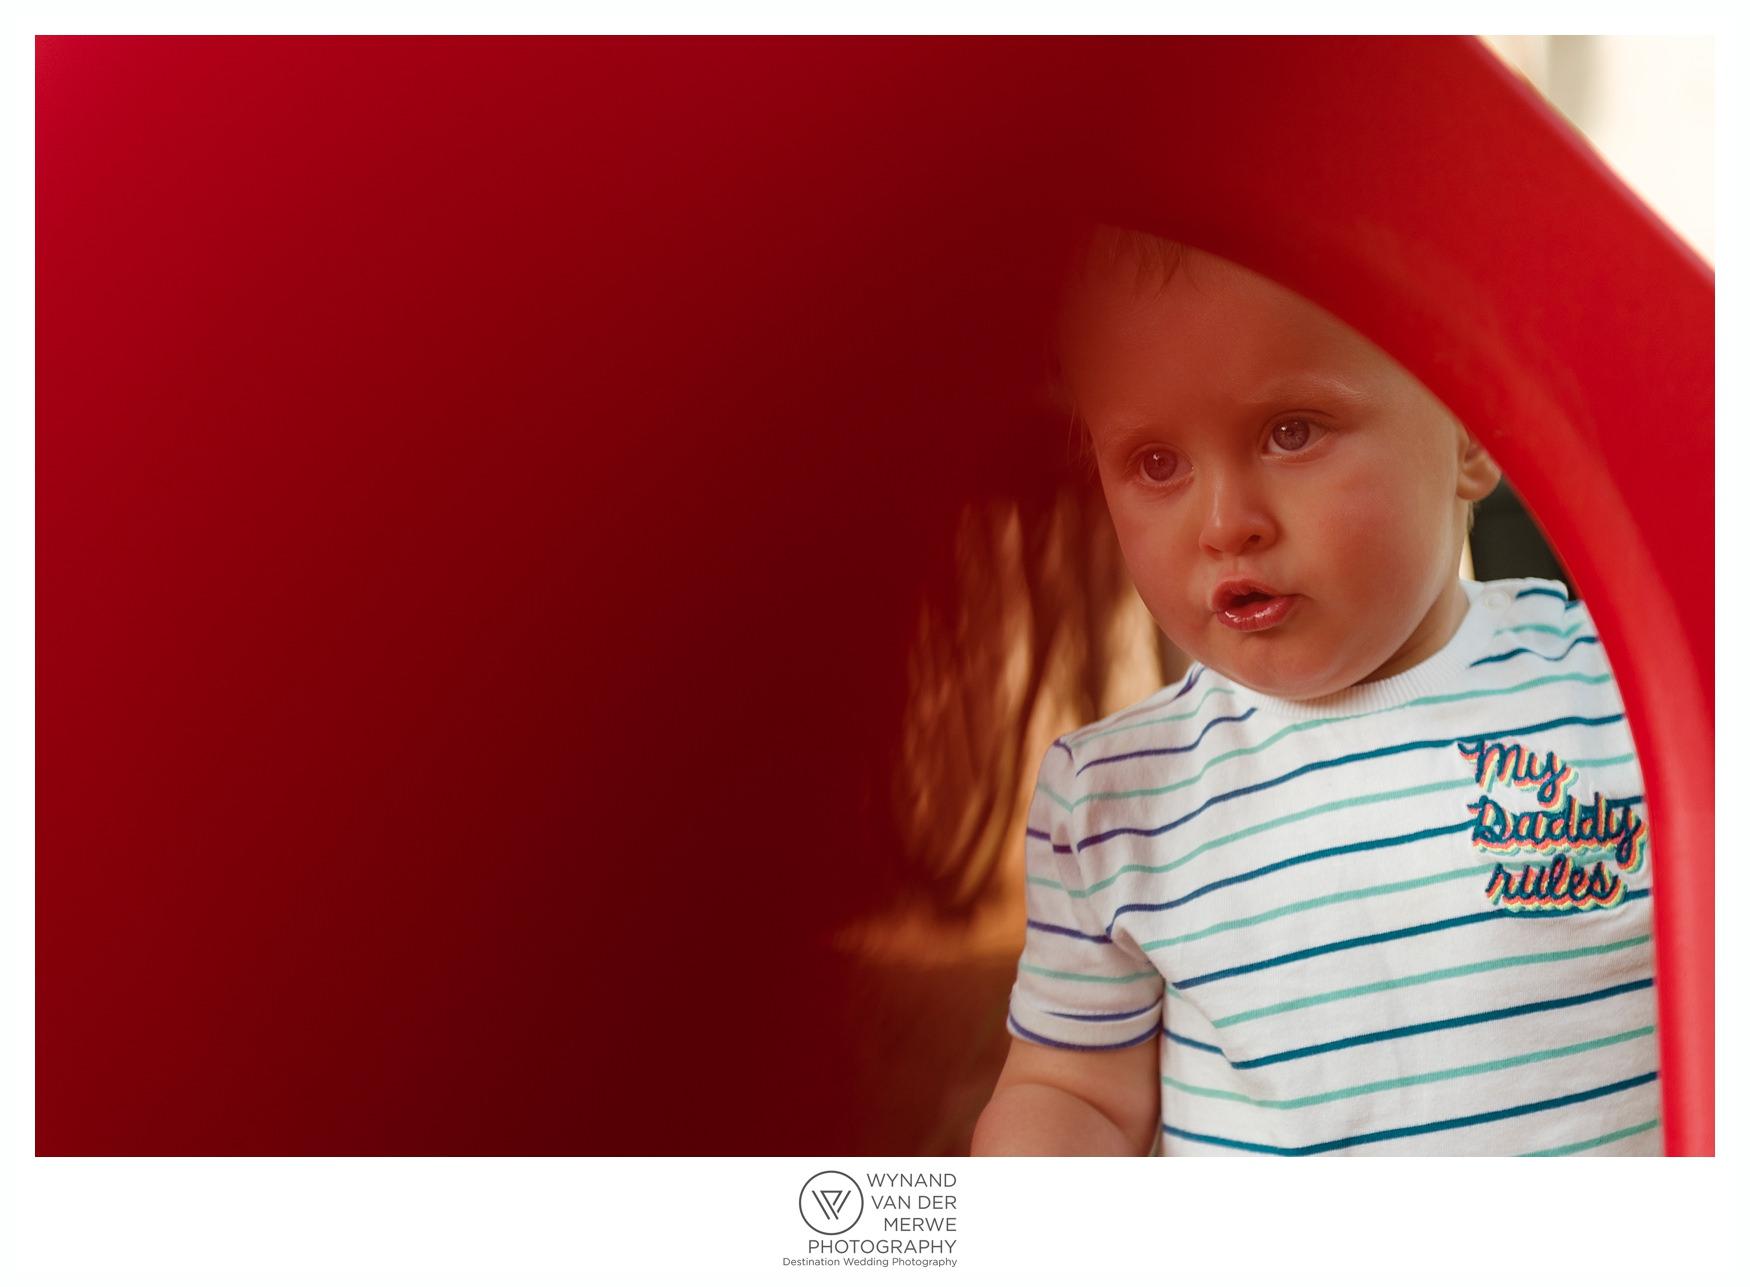 Wynandvandermerwe kirsten robert family lifestyle photography benoni location gauteng-75.jpg